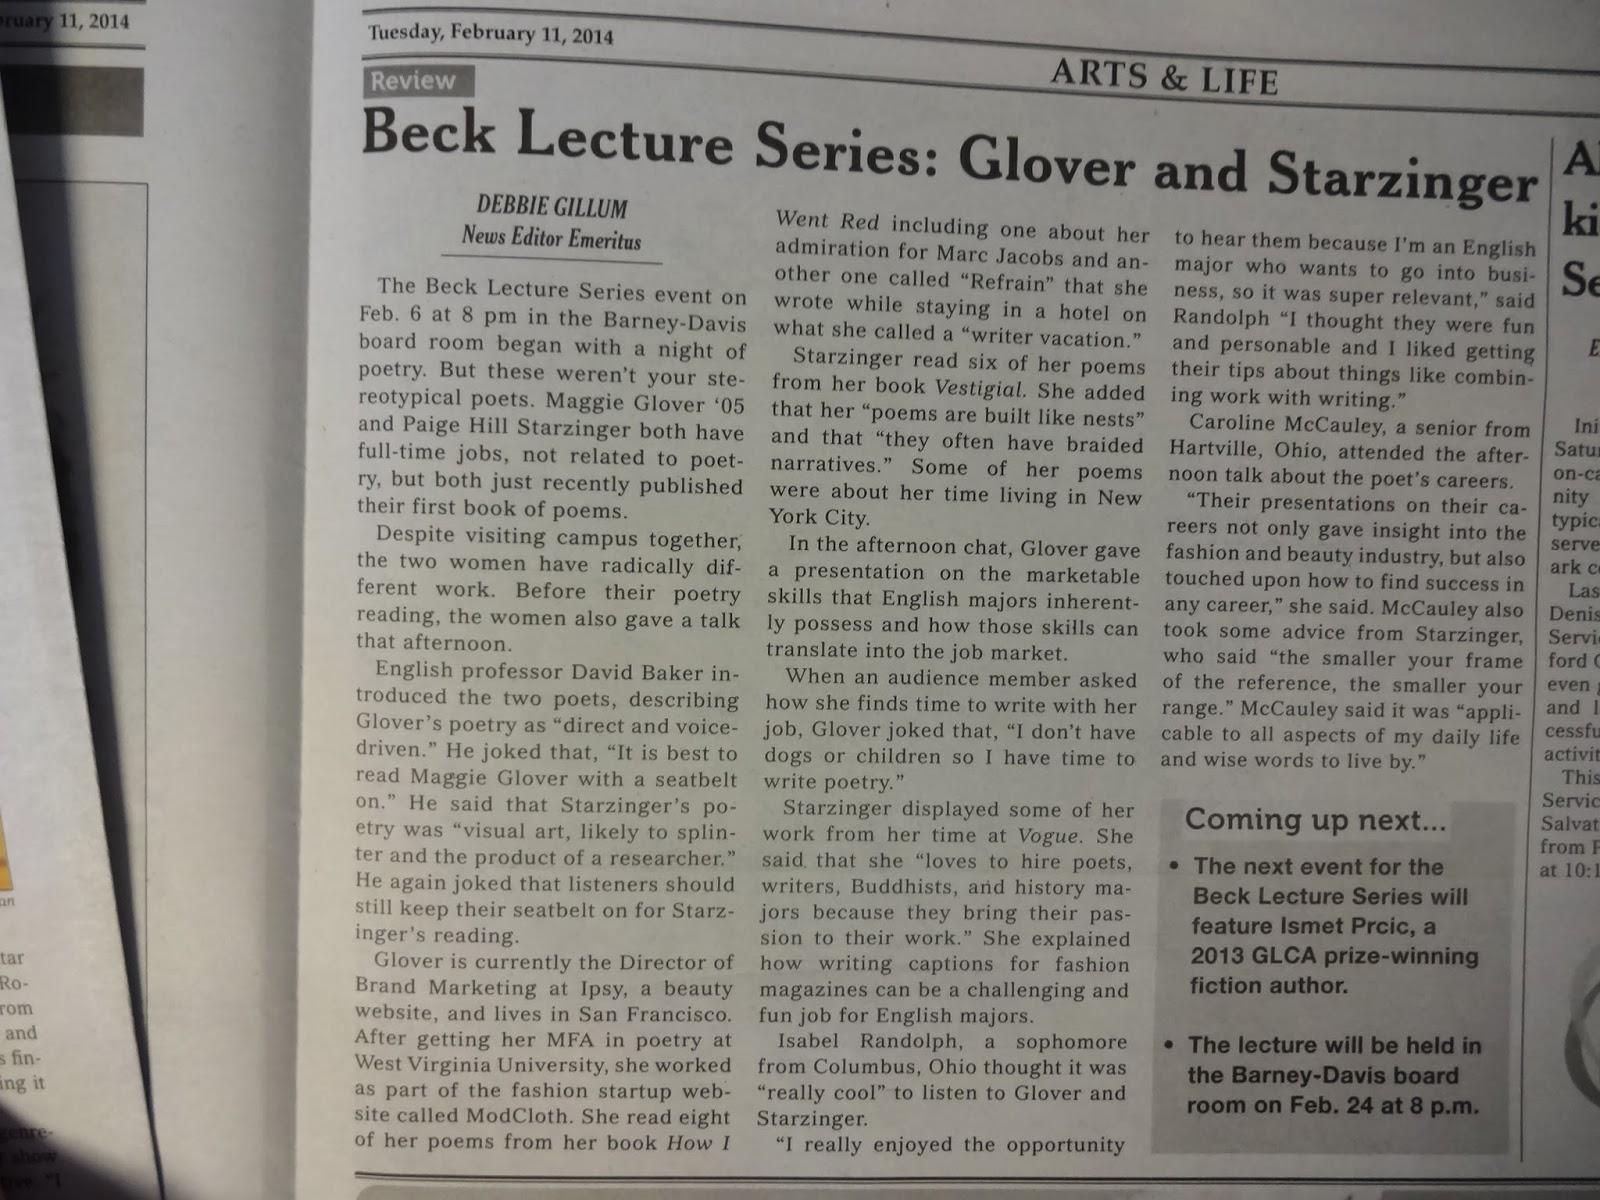 Beck Lecture Debbie Gillum